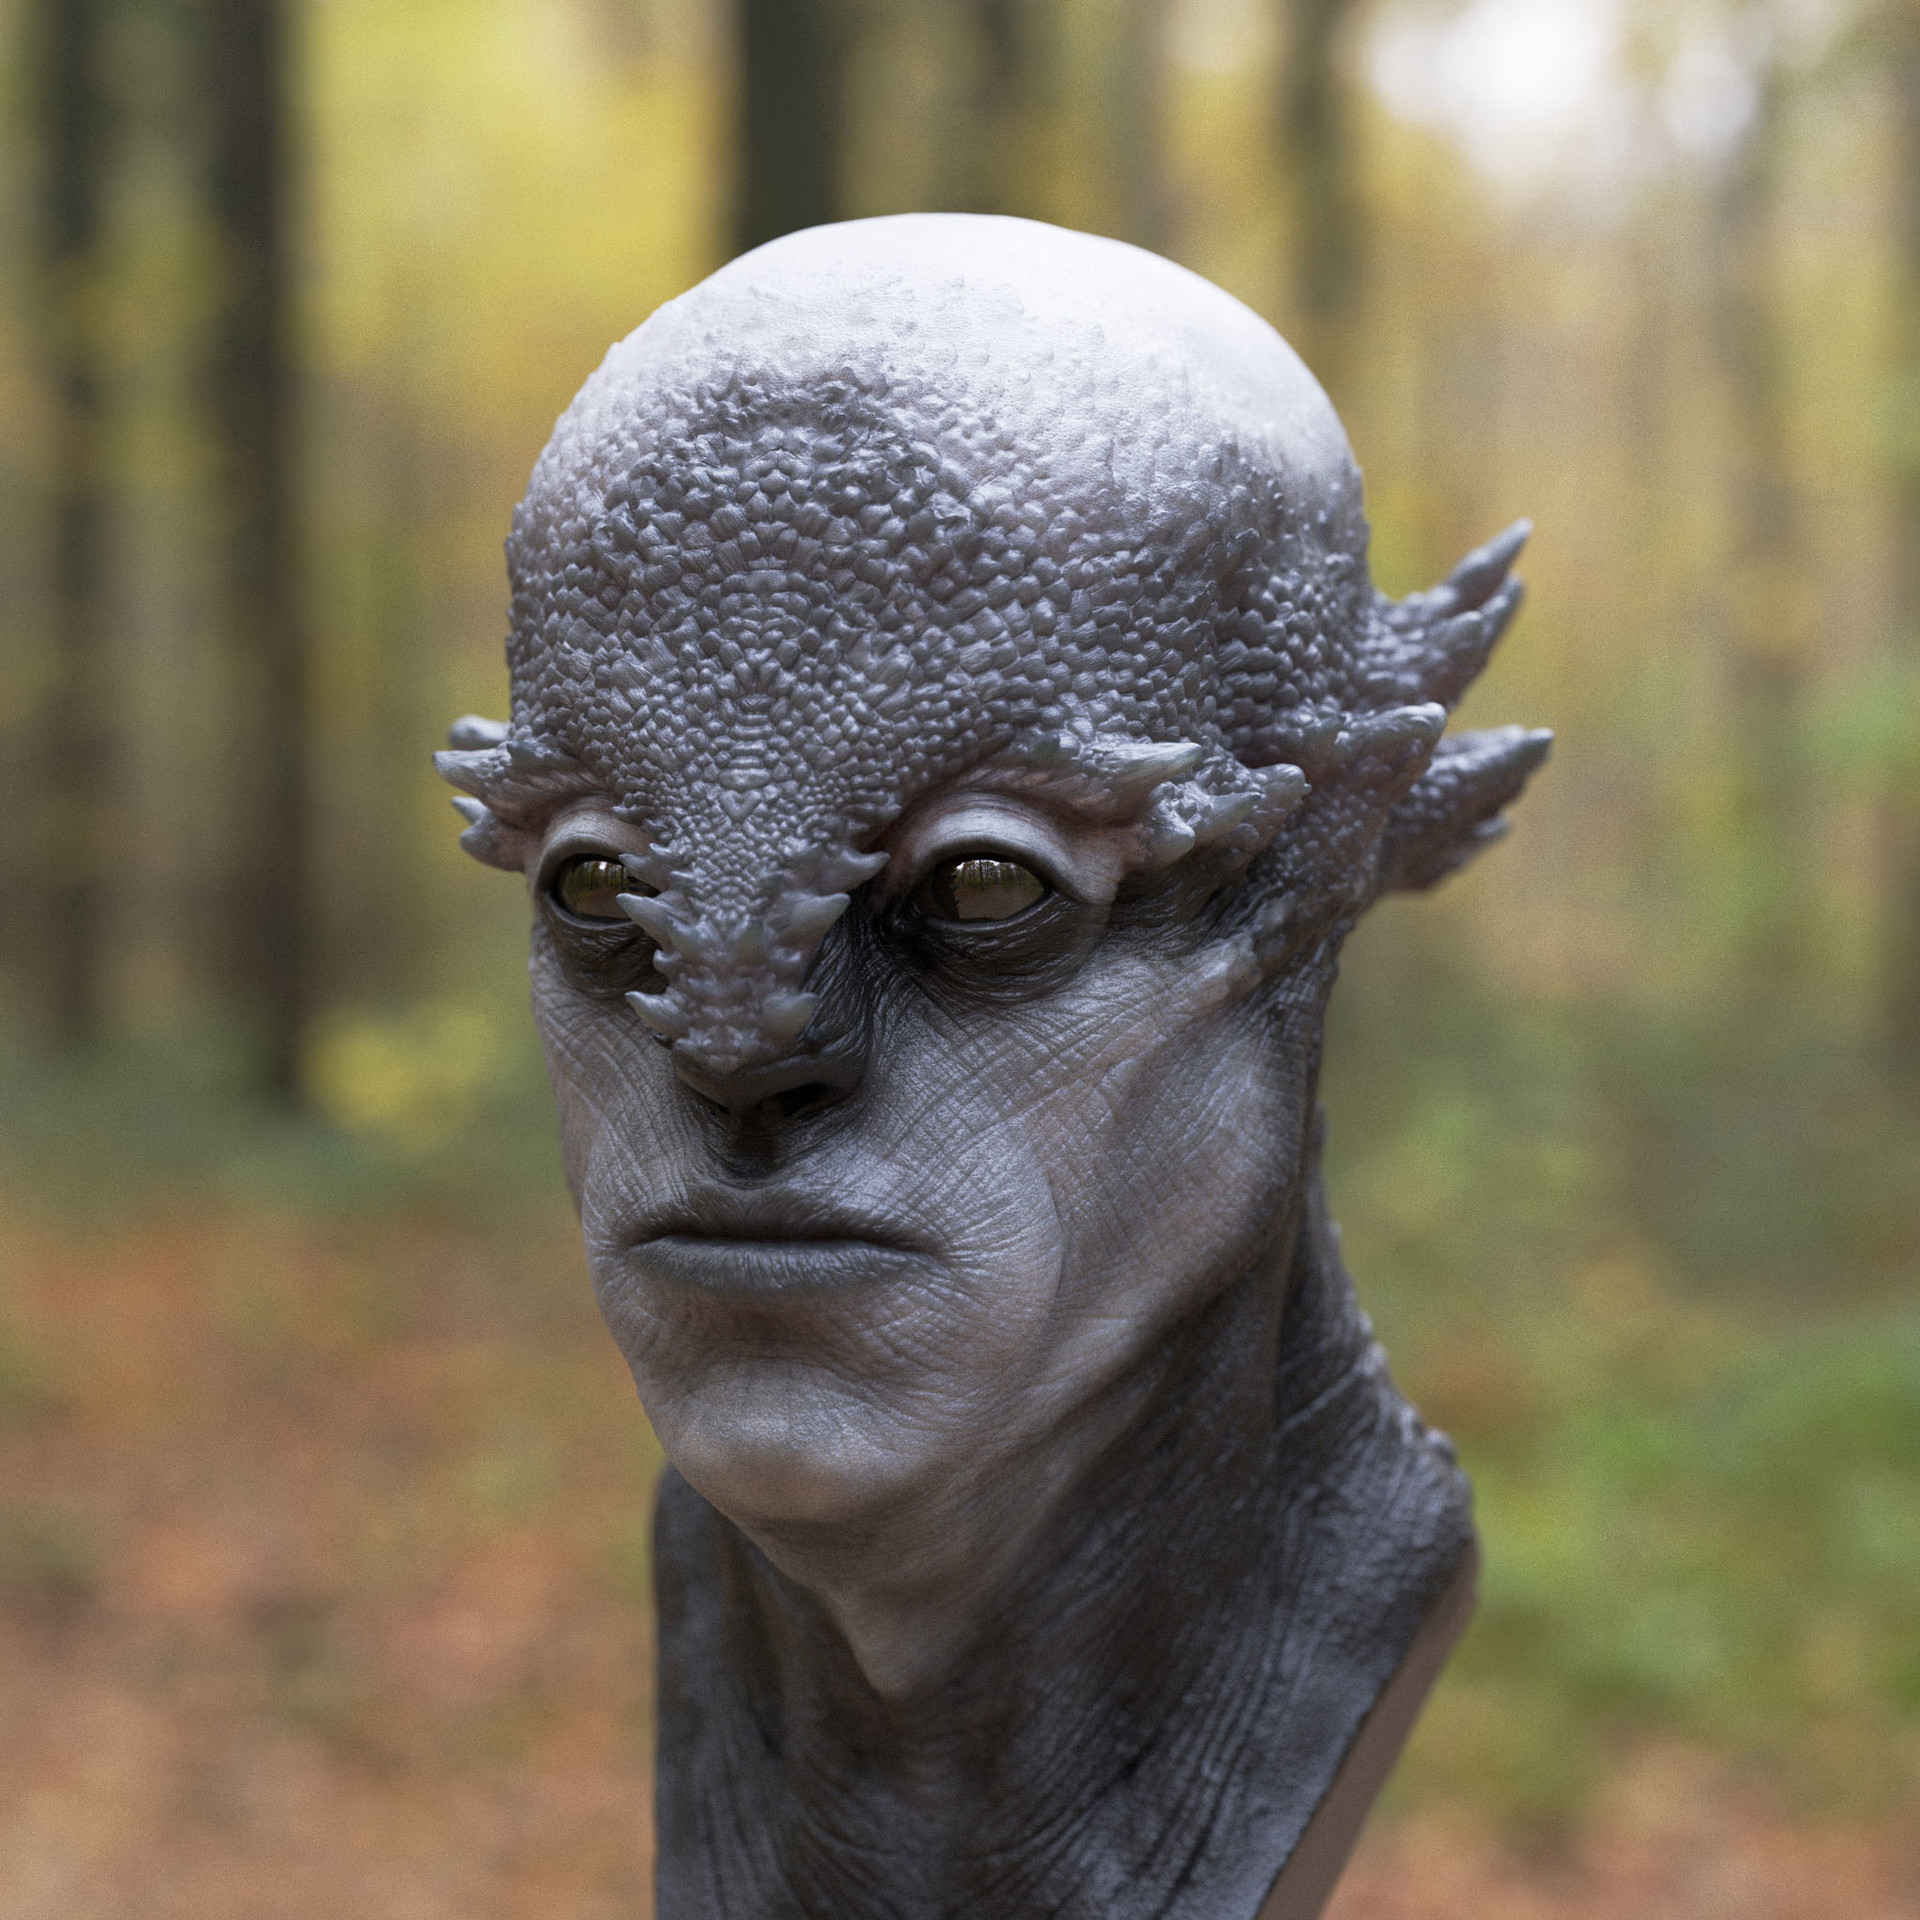 Neal biggs bonehead01 0001